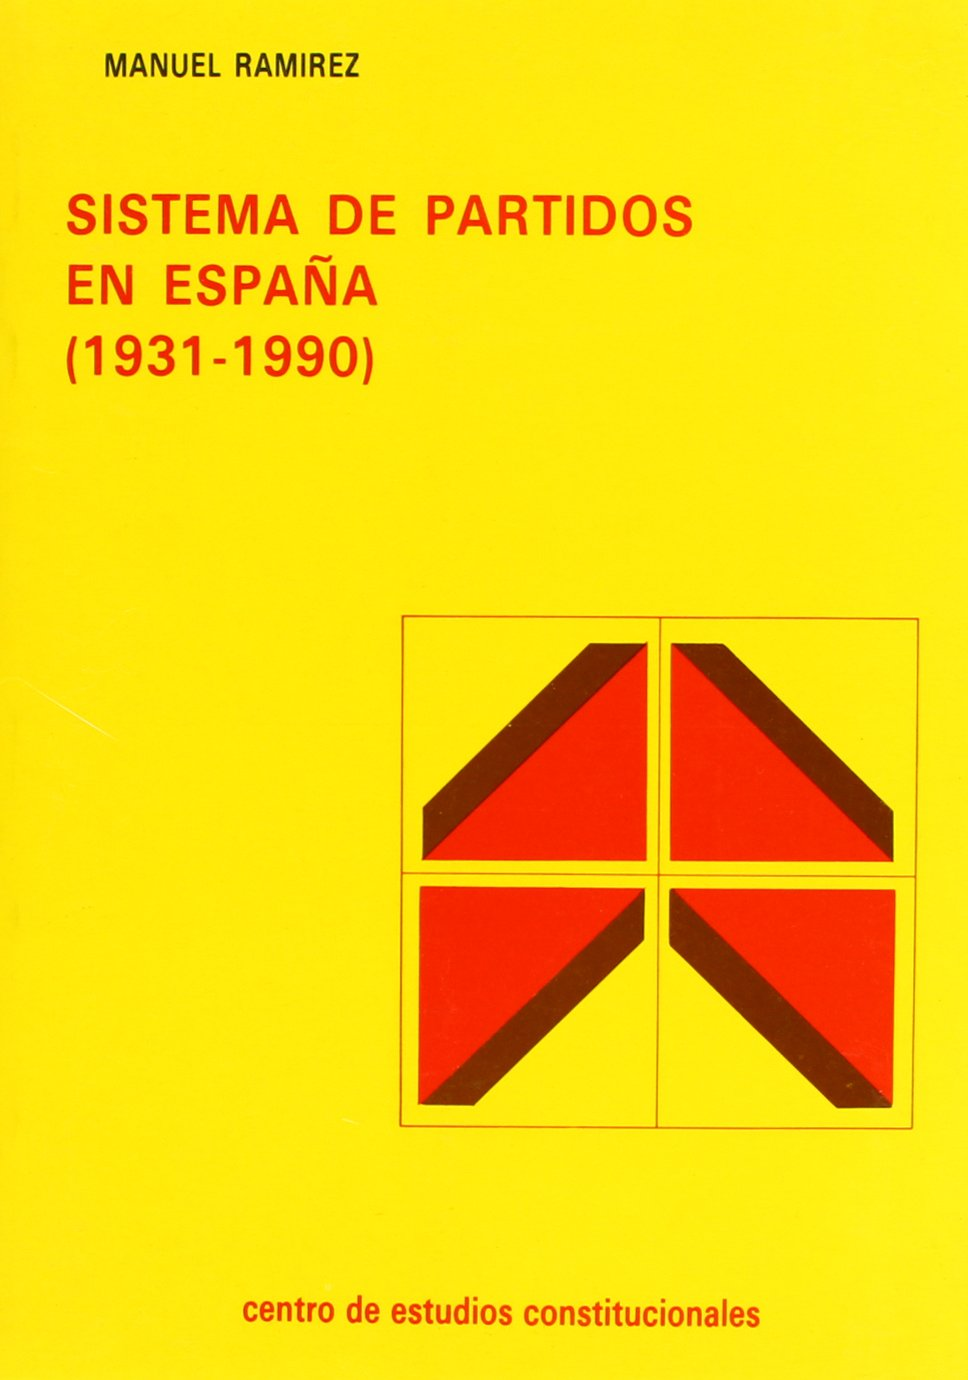 Sistema de partidos en España (1931-1990): Amazon.es: Ramirez Jimenez, Manuel: Libros